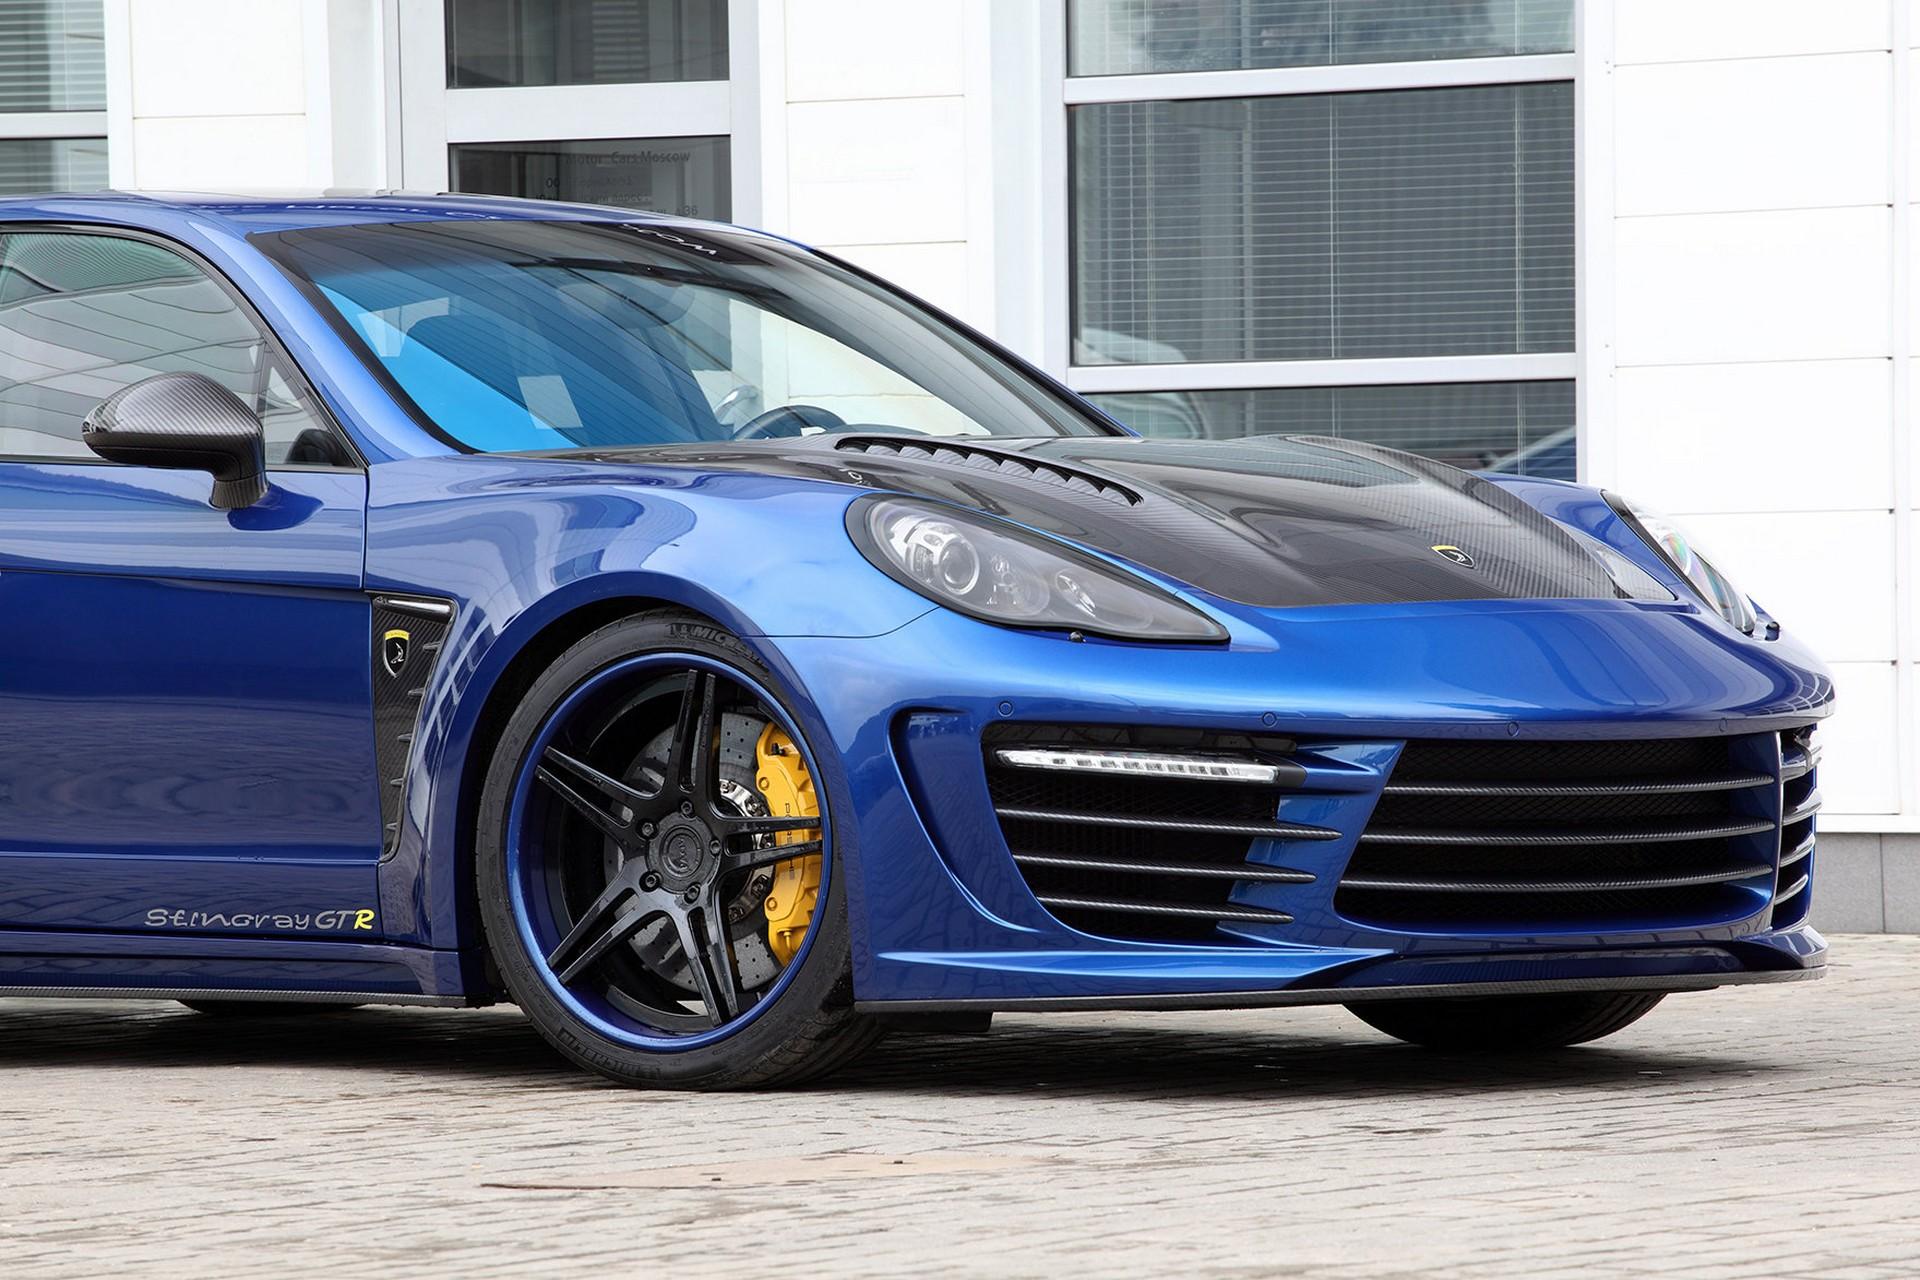 Porsche Panamera Stingray Gtr 07 25 Topcar